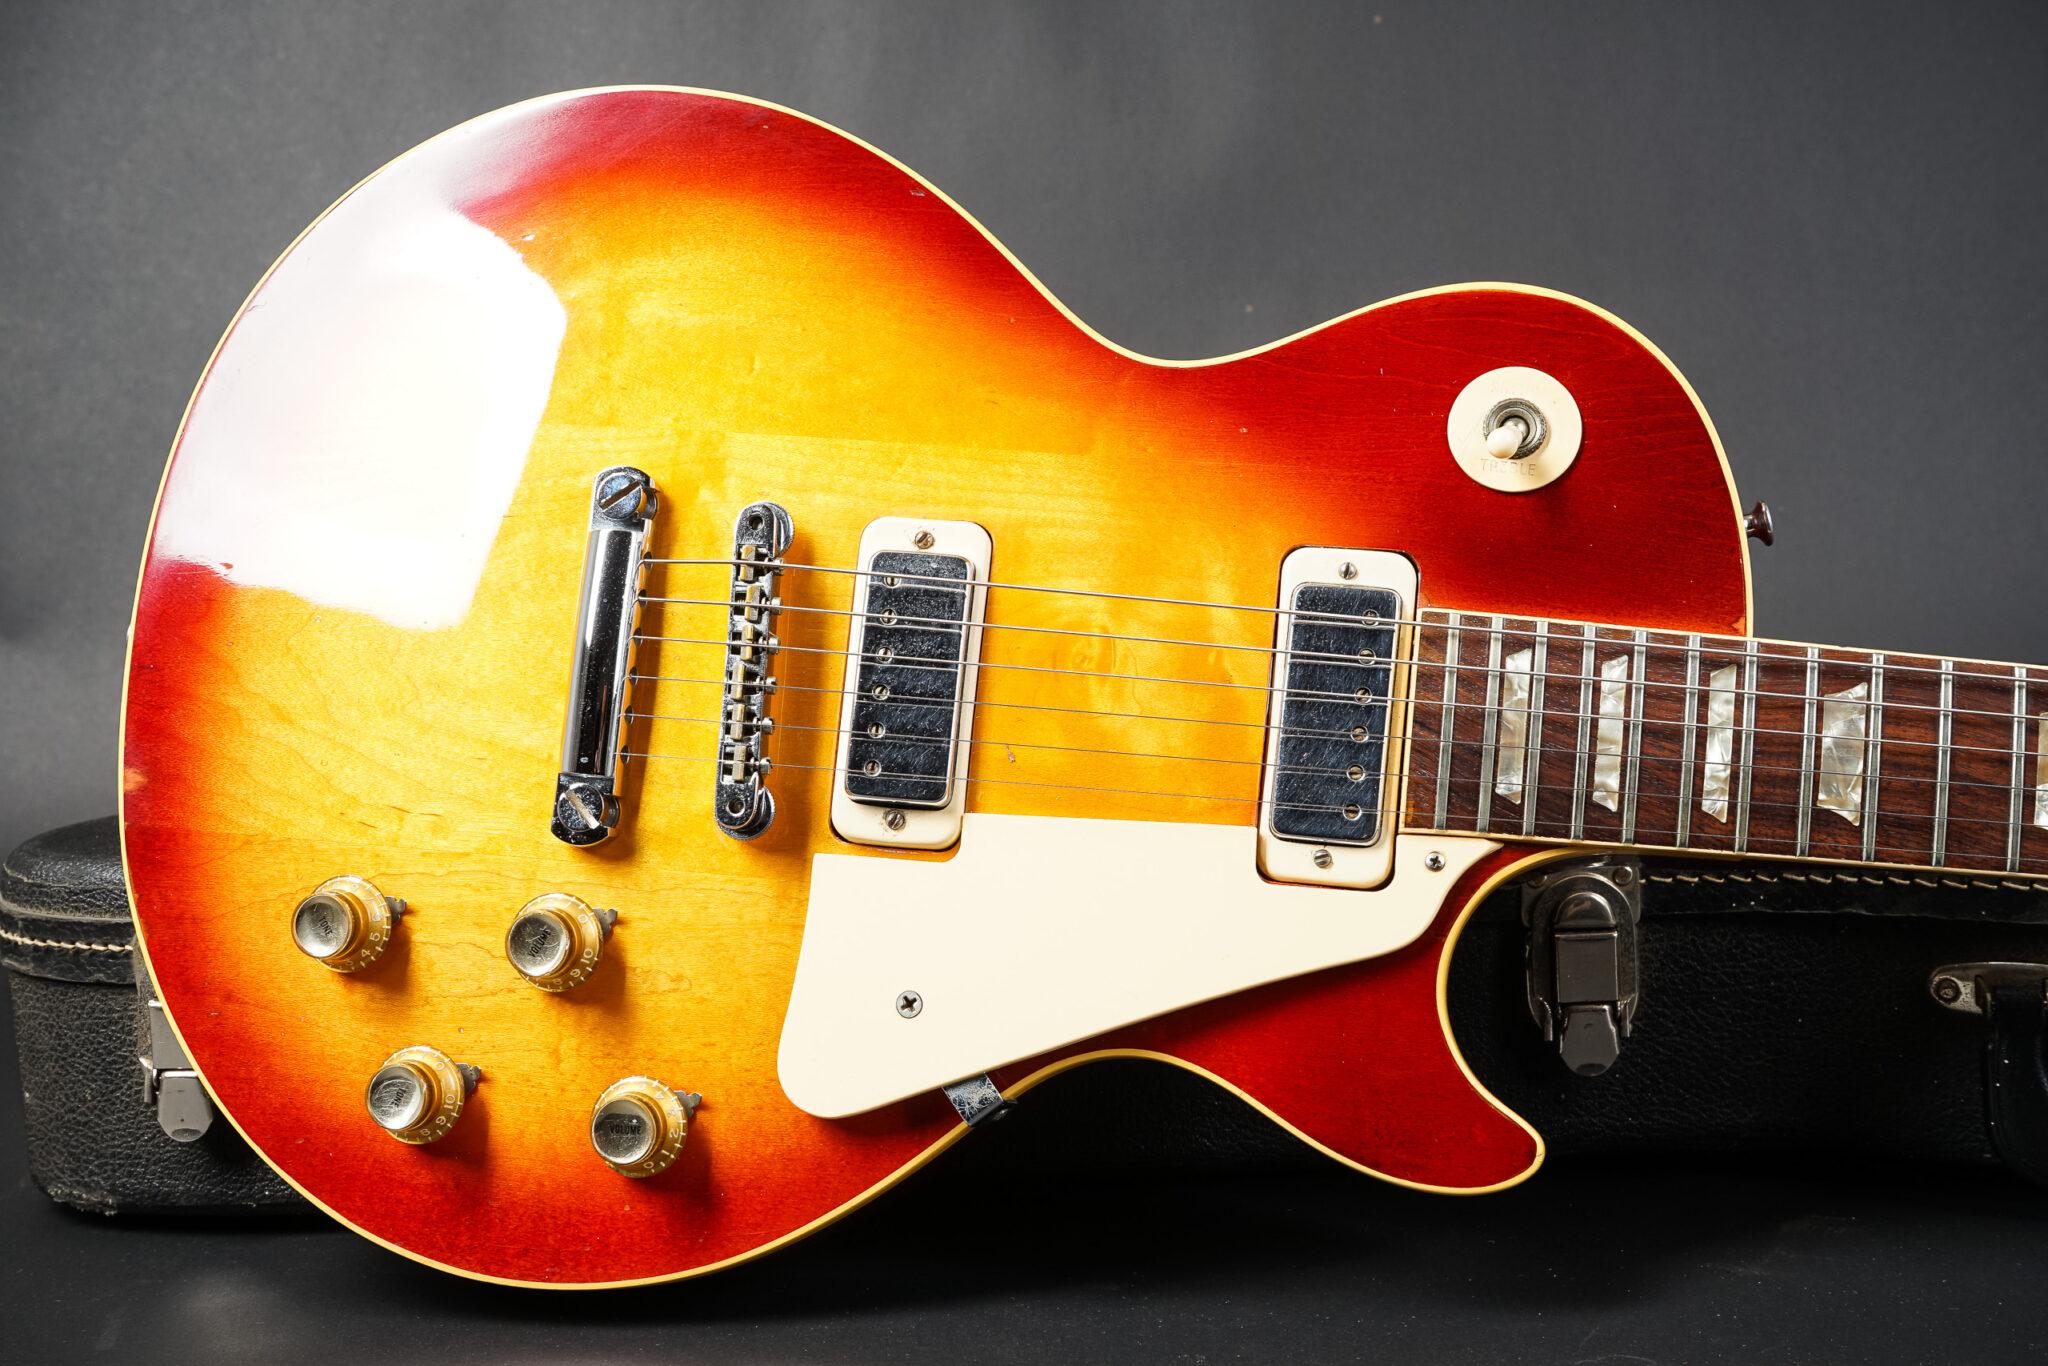 https://guitarpoint.de/app/uploads/products/1974-gibson-les-paul-deluxe-sunburst-2/1974-Gibson-Les-Paul-Deluxe-Sunburst-171559-10-2048x1366.jpg